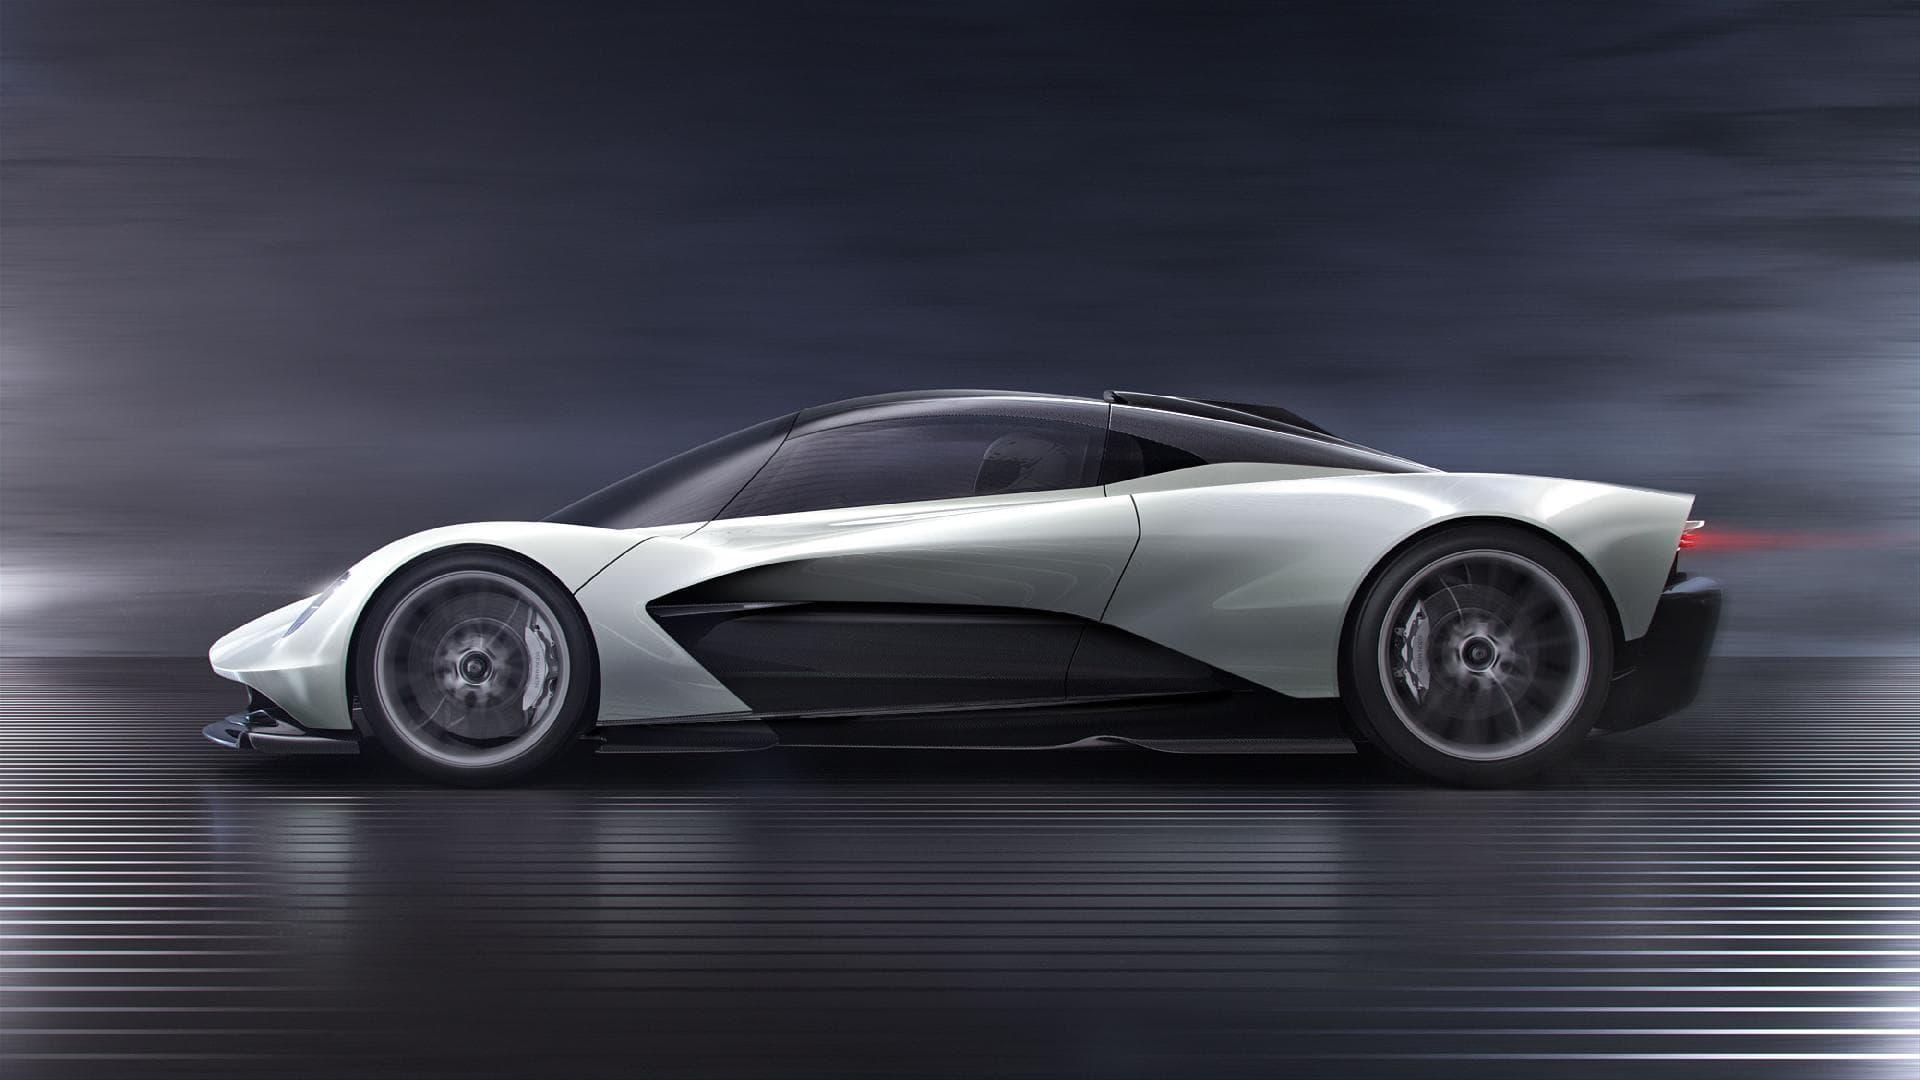 Aston Martin представил гиперкар Valhalla с гибридной трансмиссией